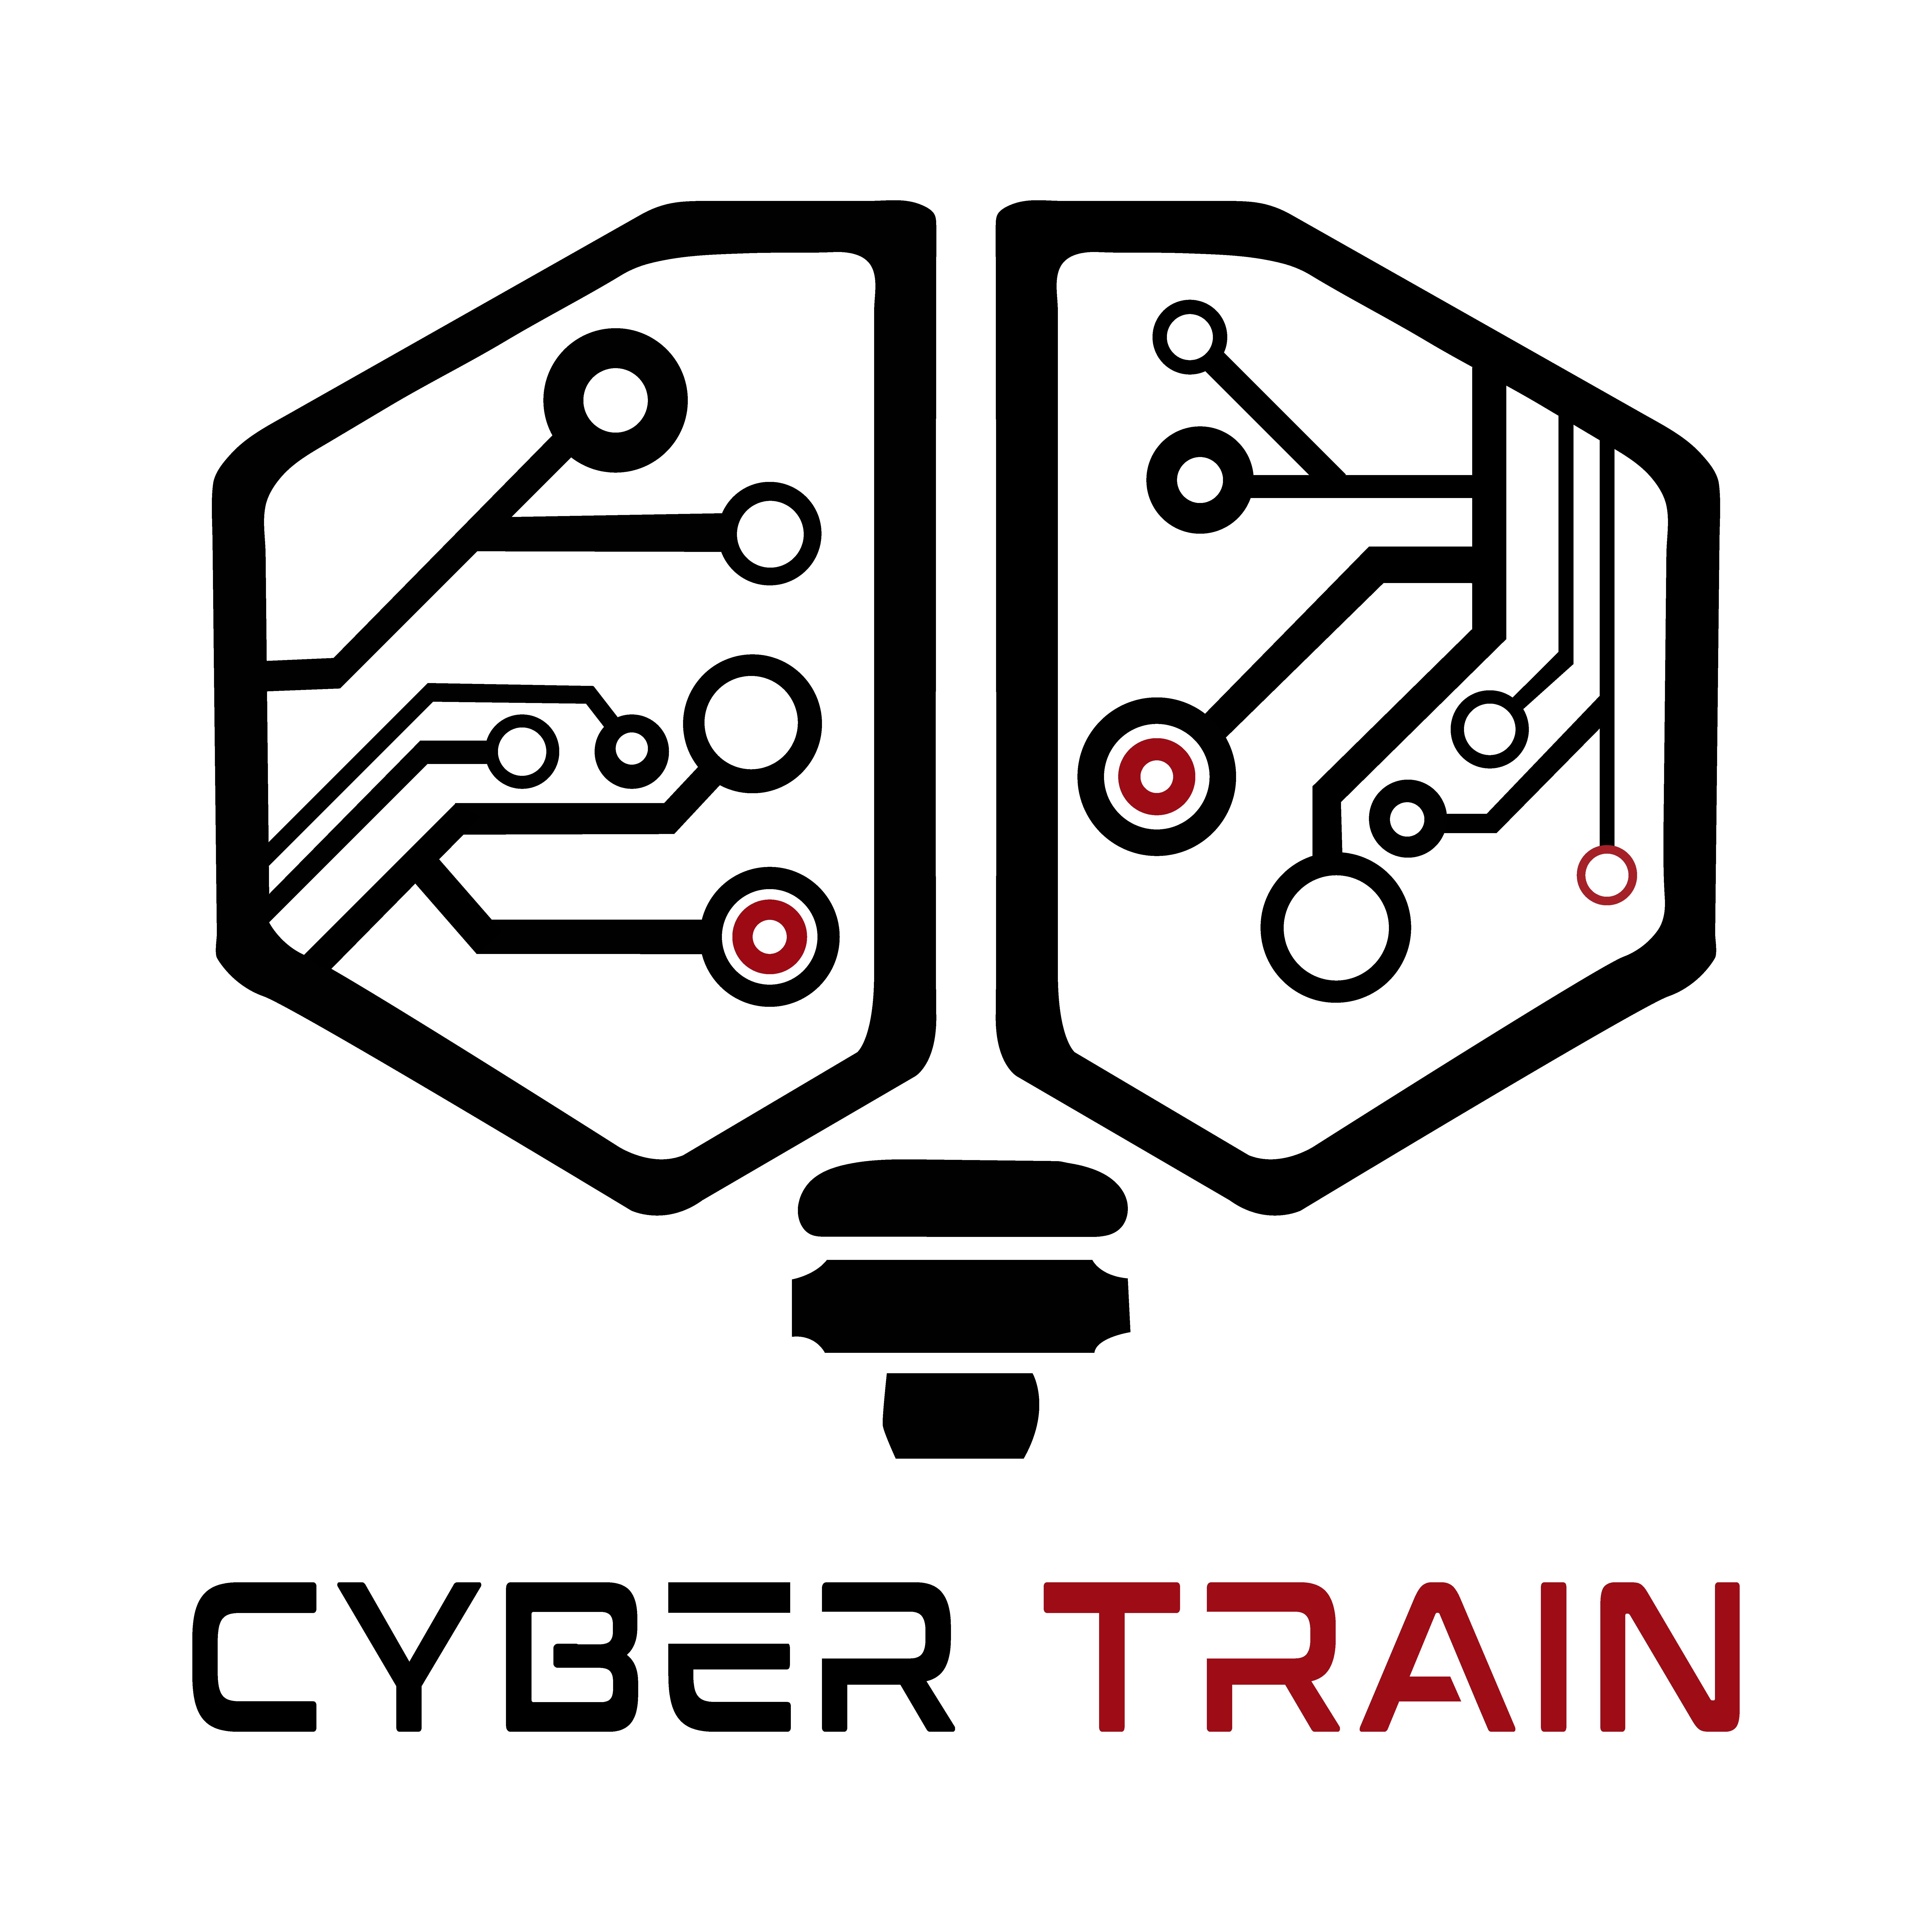 Cyber Train